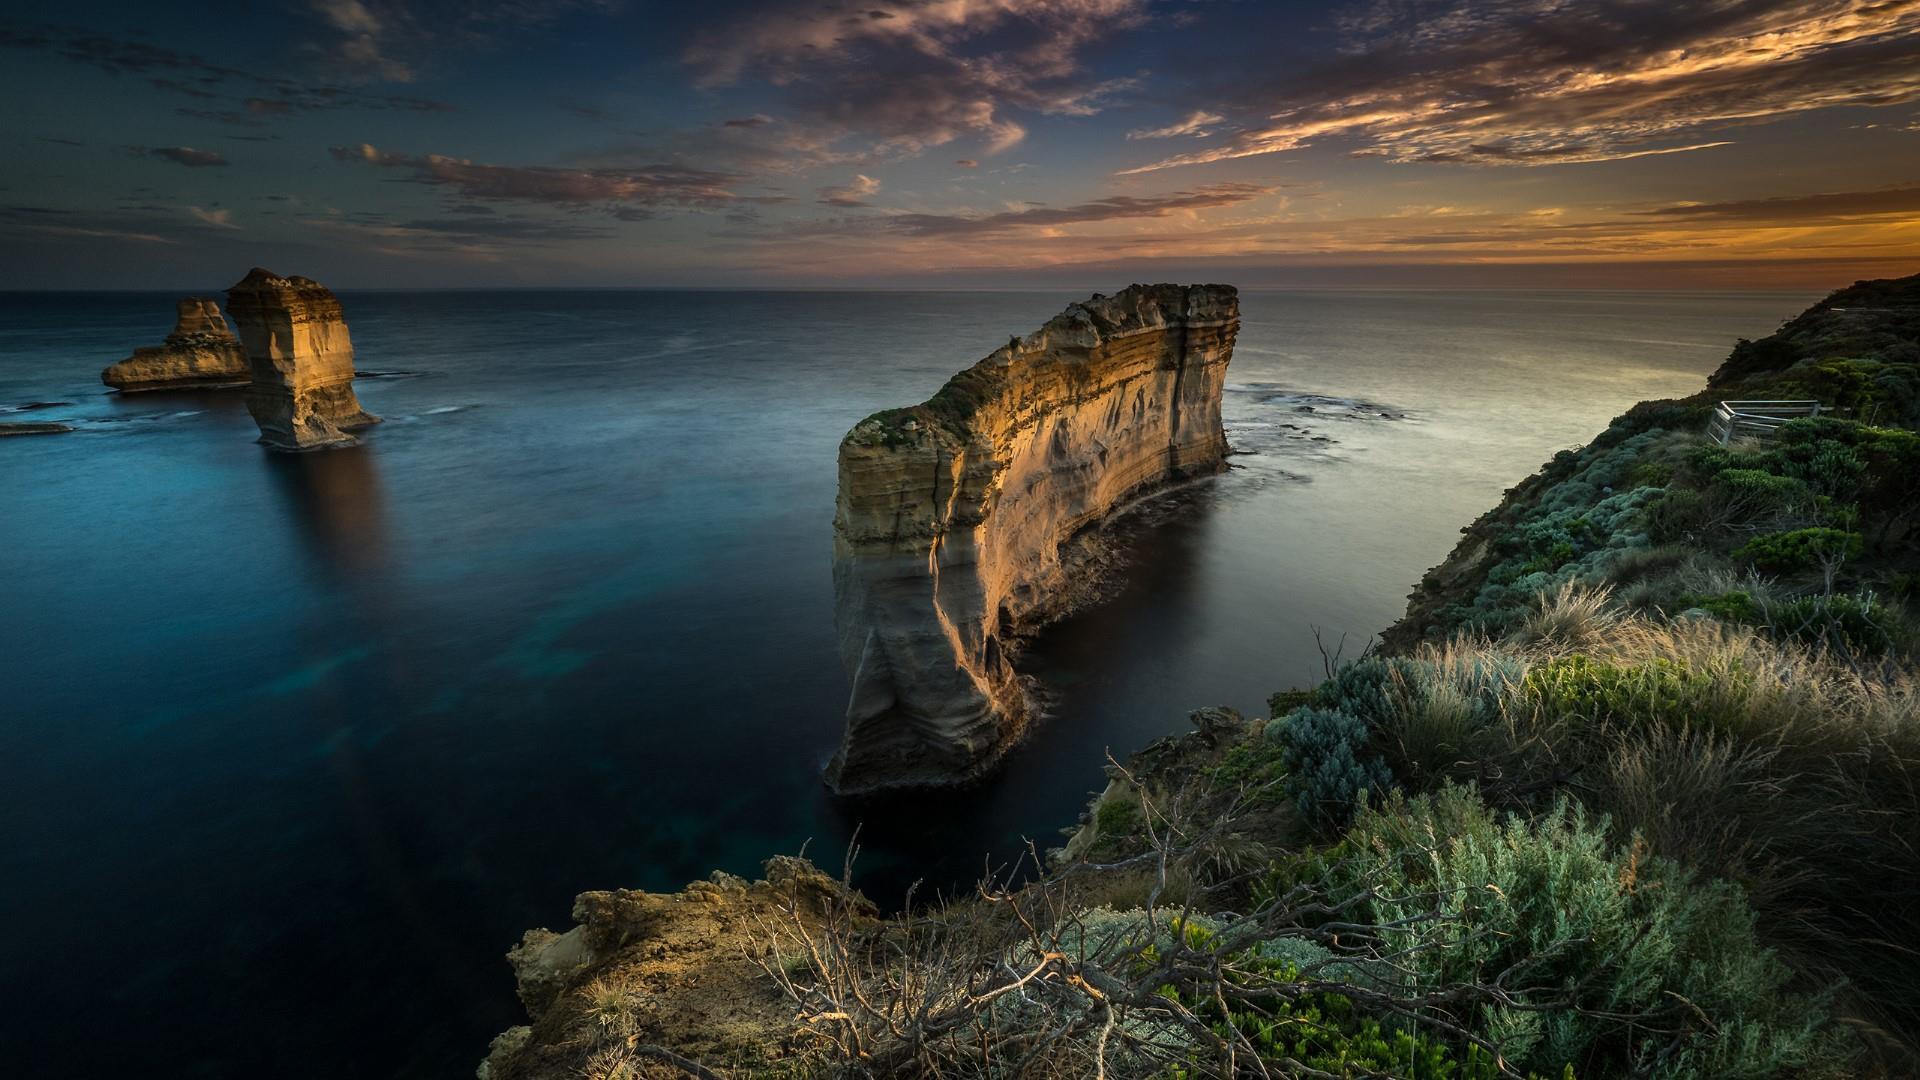 Sunset scene from the Great Ocean Road, Victoria, Australia wallpaper